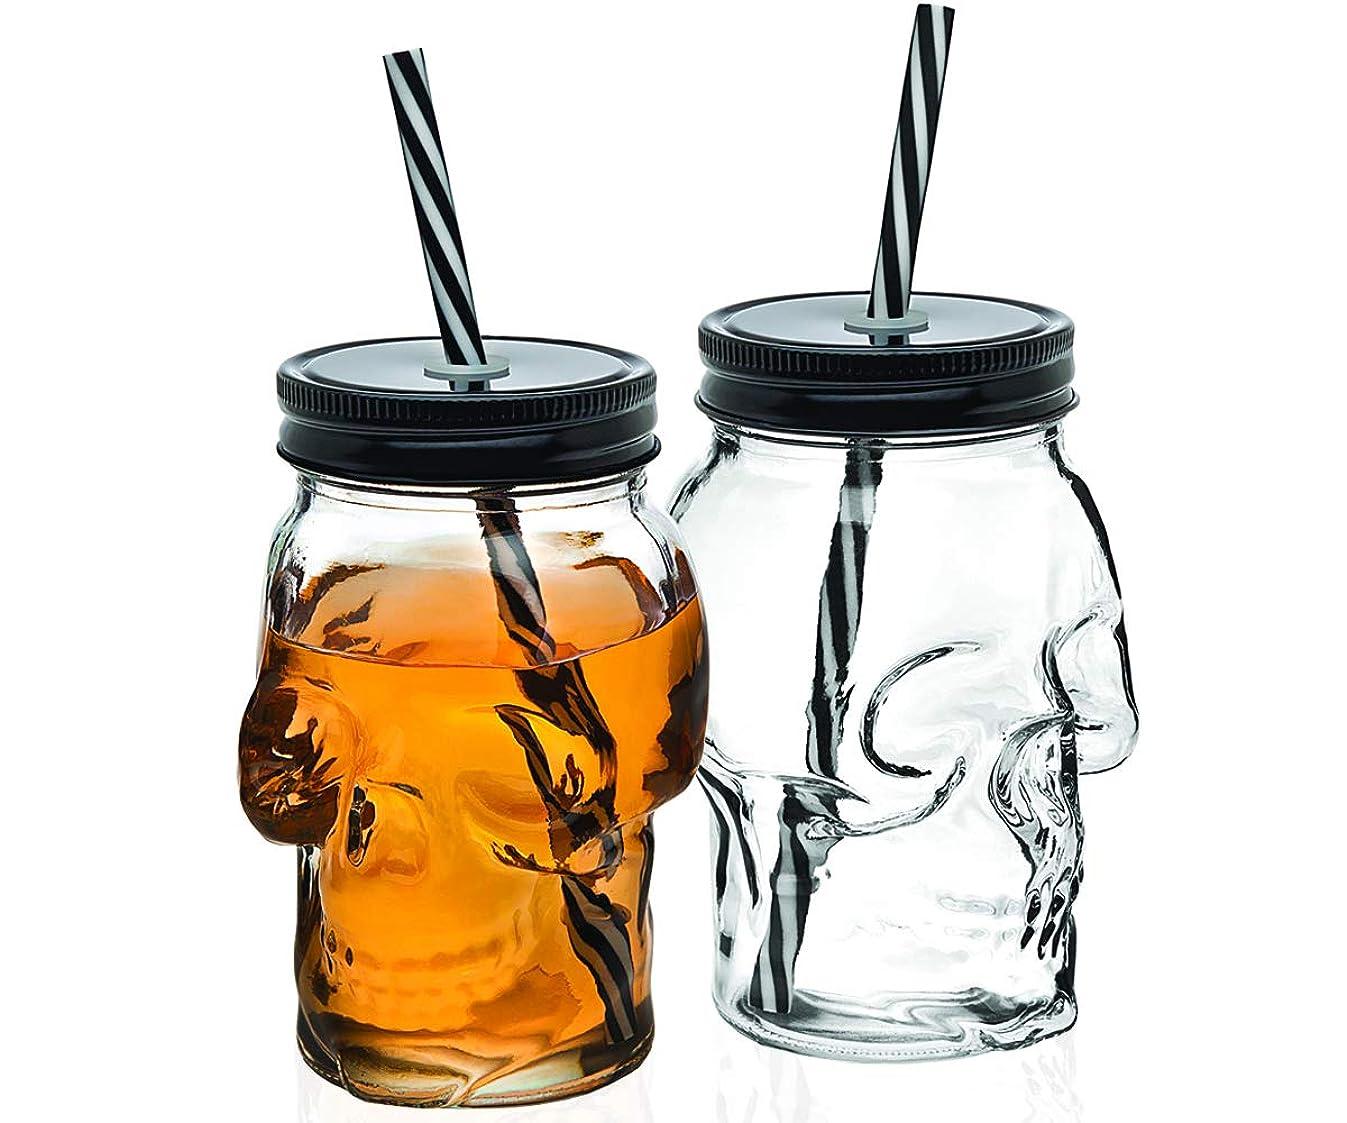 Skull Mason Jar Mug Glass Tumbler Cup with Cover and Straw - 16oz, Set of 2